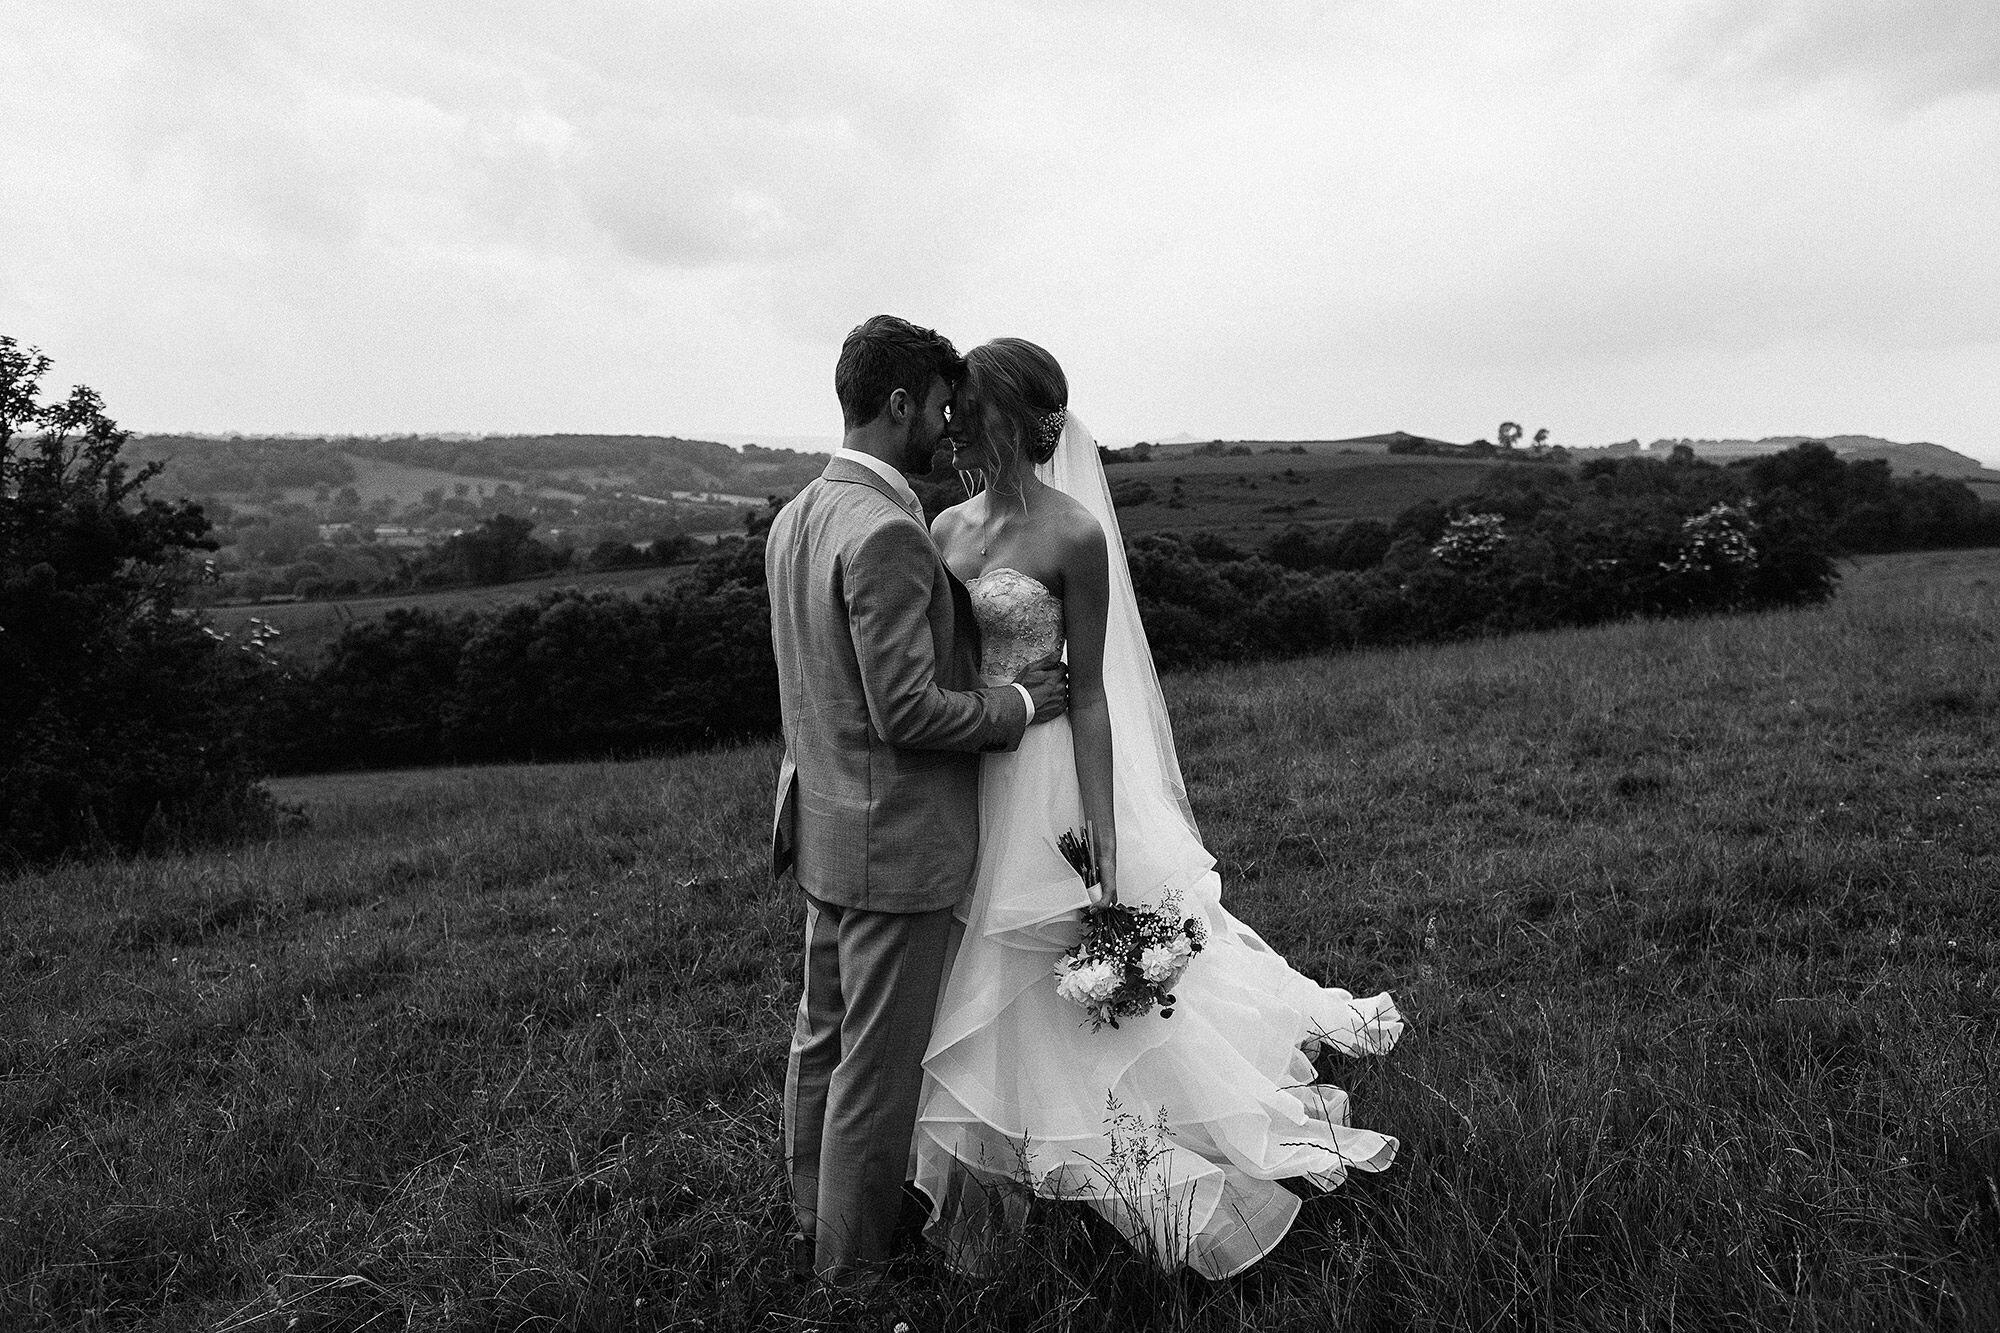 taisy-matthew-wed-2016-0355